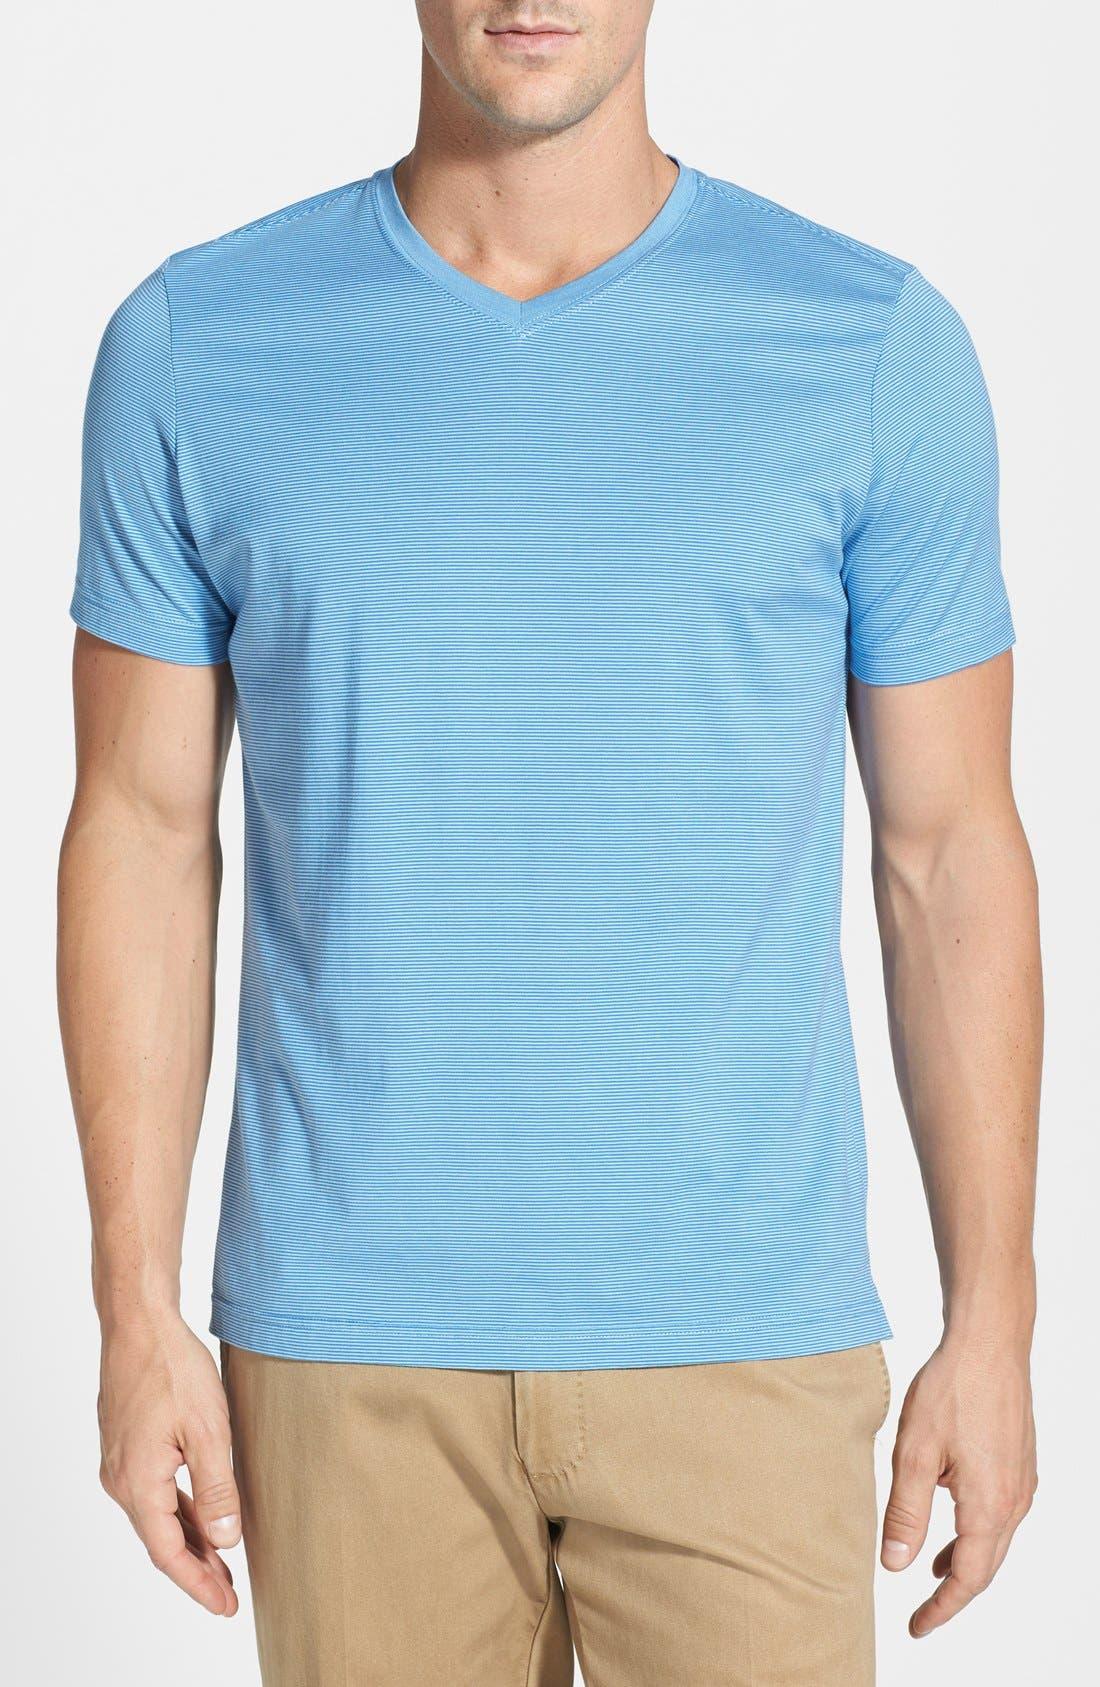 Main Image - Robert Barakett 'Armand' Modern Fit V-Neck T-Shirt